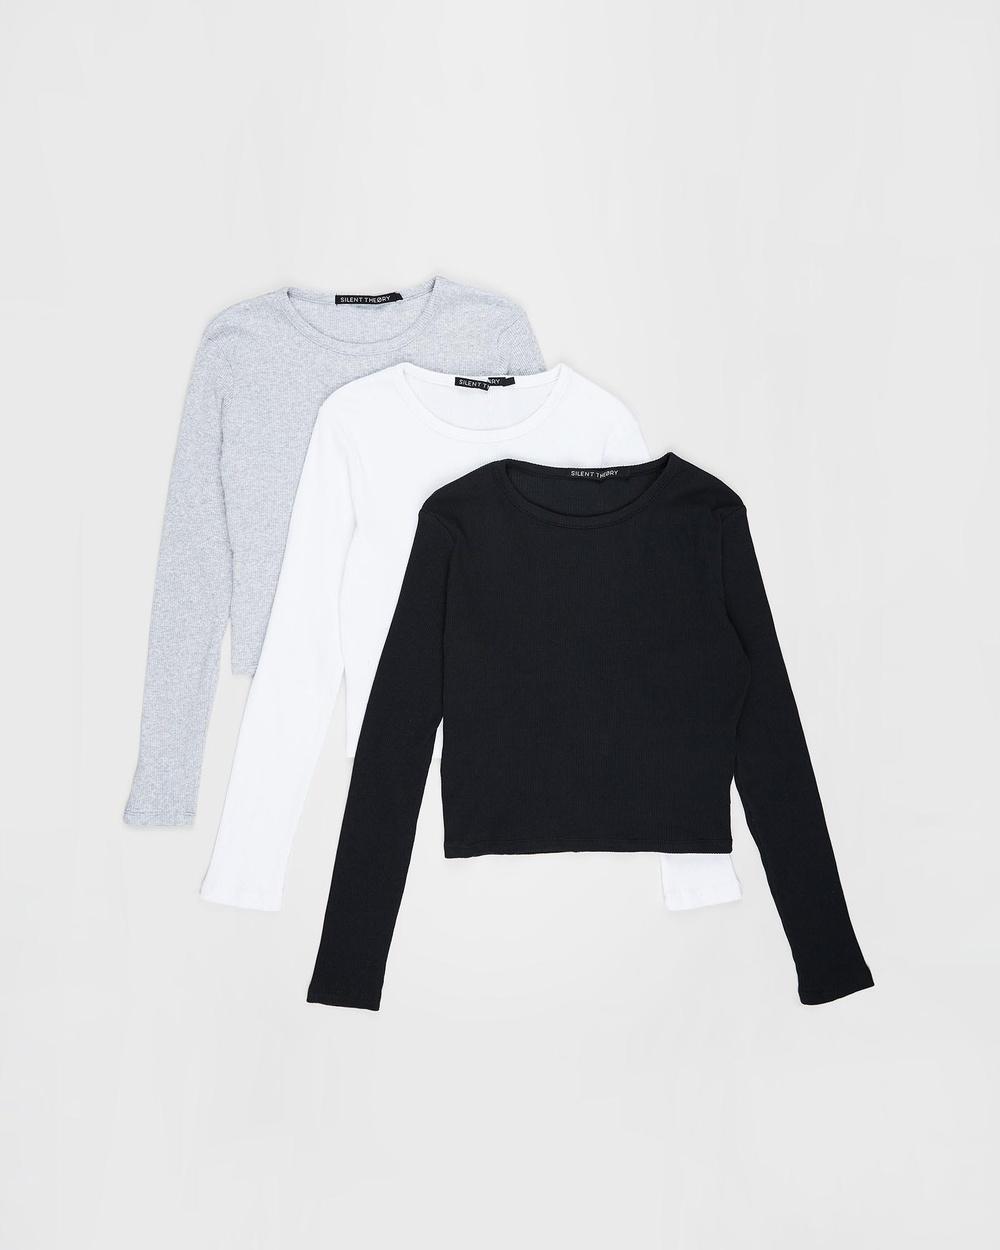 Silent Theory - 3 Pack Manhattan Long Sleeve Tee - T-Shirts & Singlets (MULTICOLOURED) 3-Pack Manhattan Long Sleeve Tee